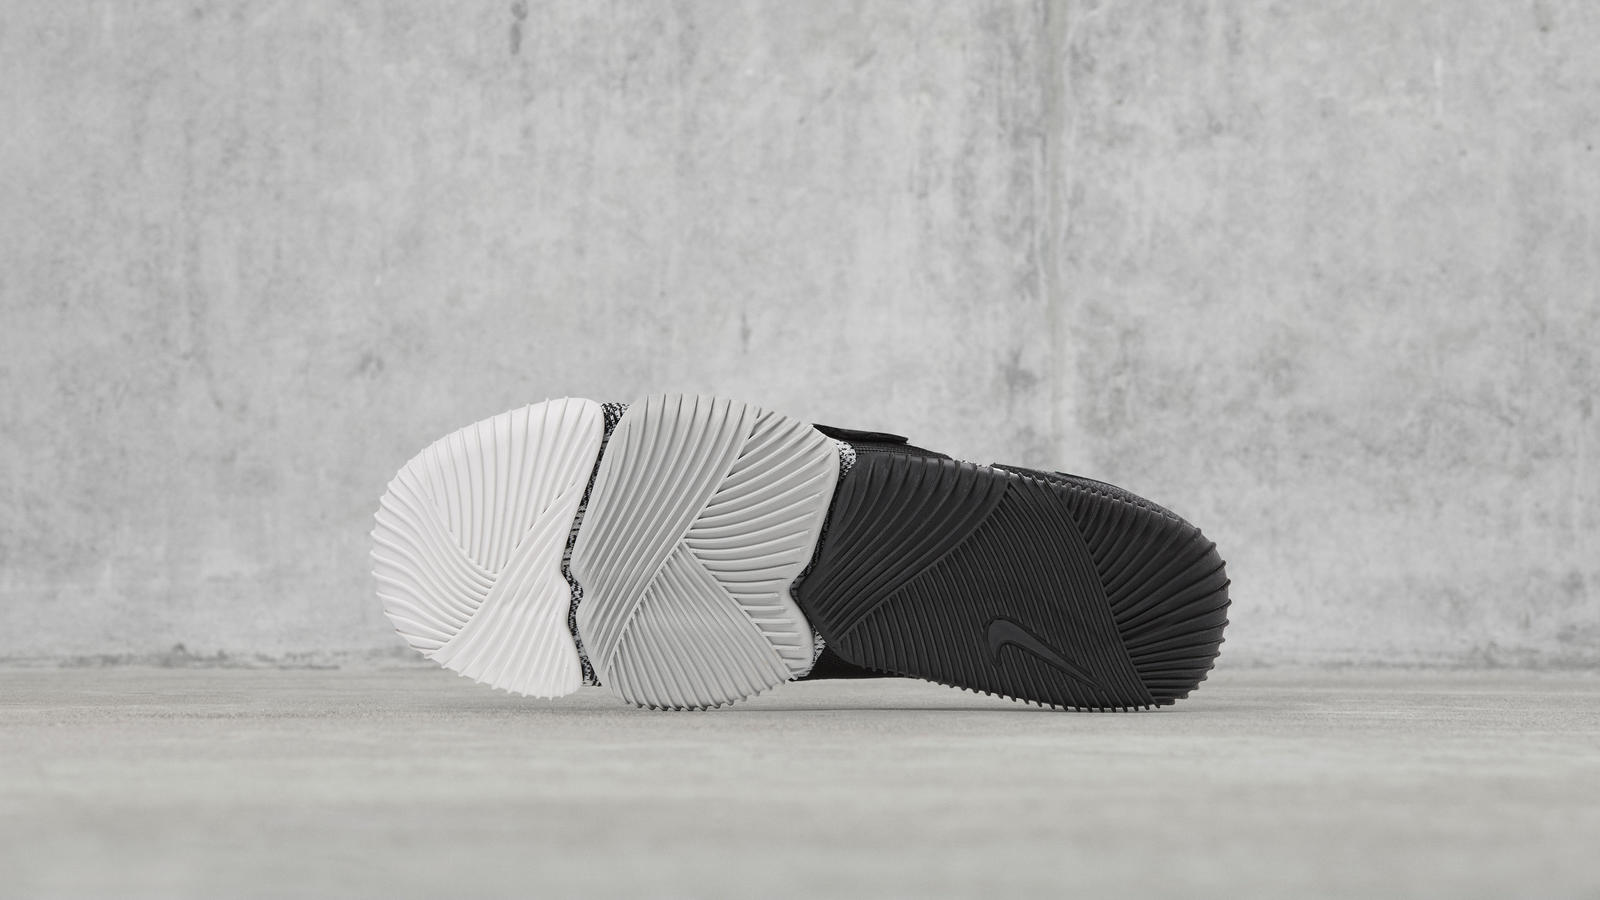 ade29c0e9fdb NikeLab Aqua Sock 360 - Nike News